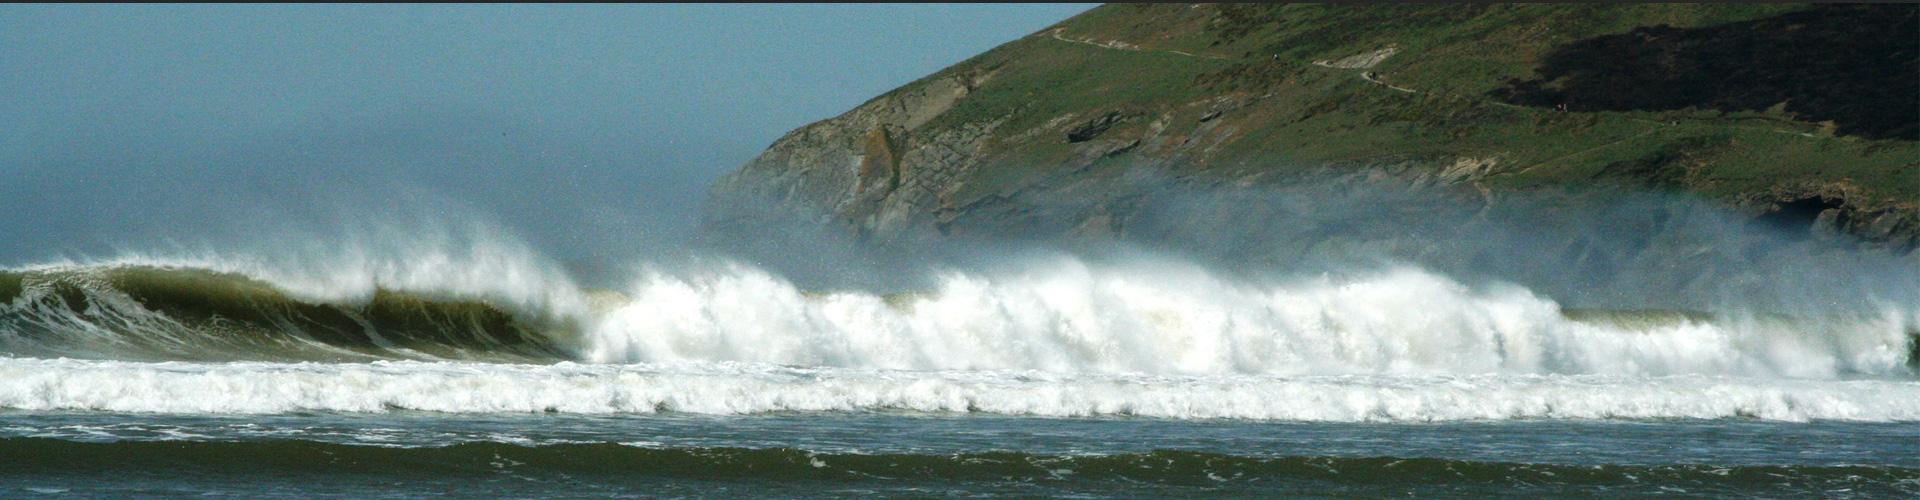 croyde-surf-2